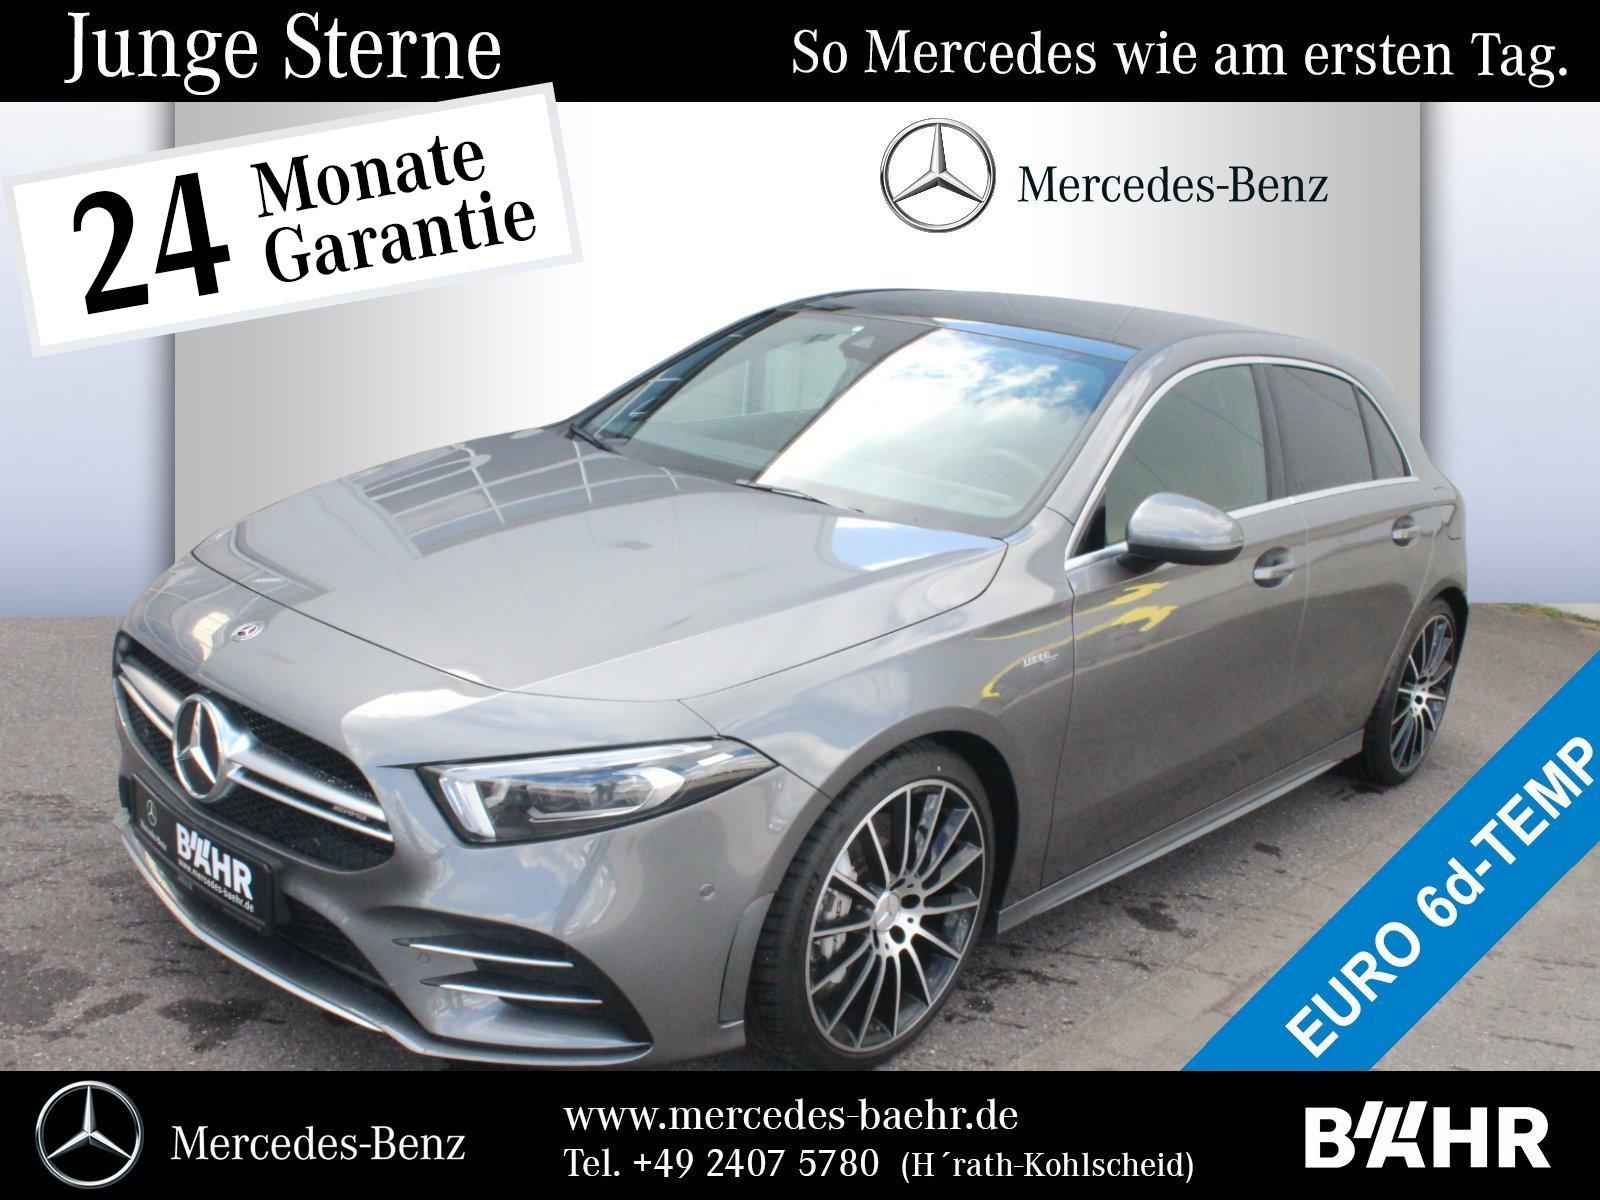 Mercedes-Benz A 35 AMG 4M MBUX-Navi-Premium/Multibeam/RFK/Pano, Jahr 2019, Benzin